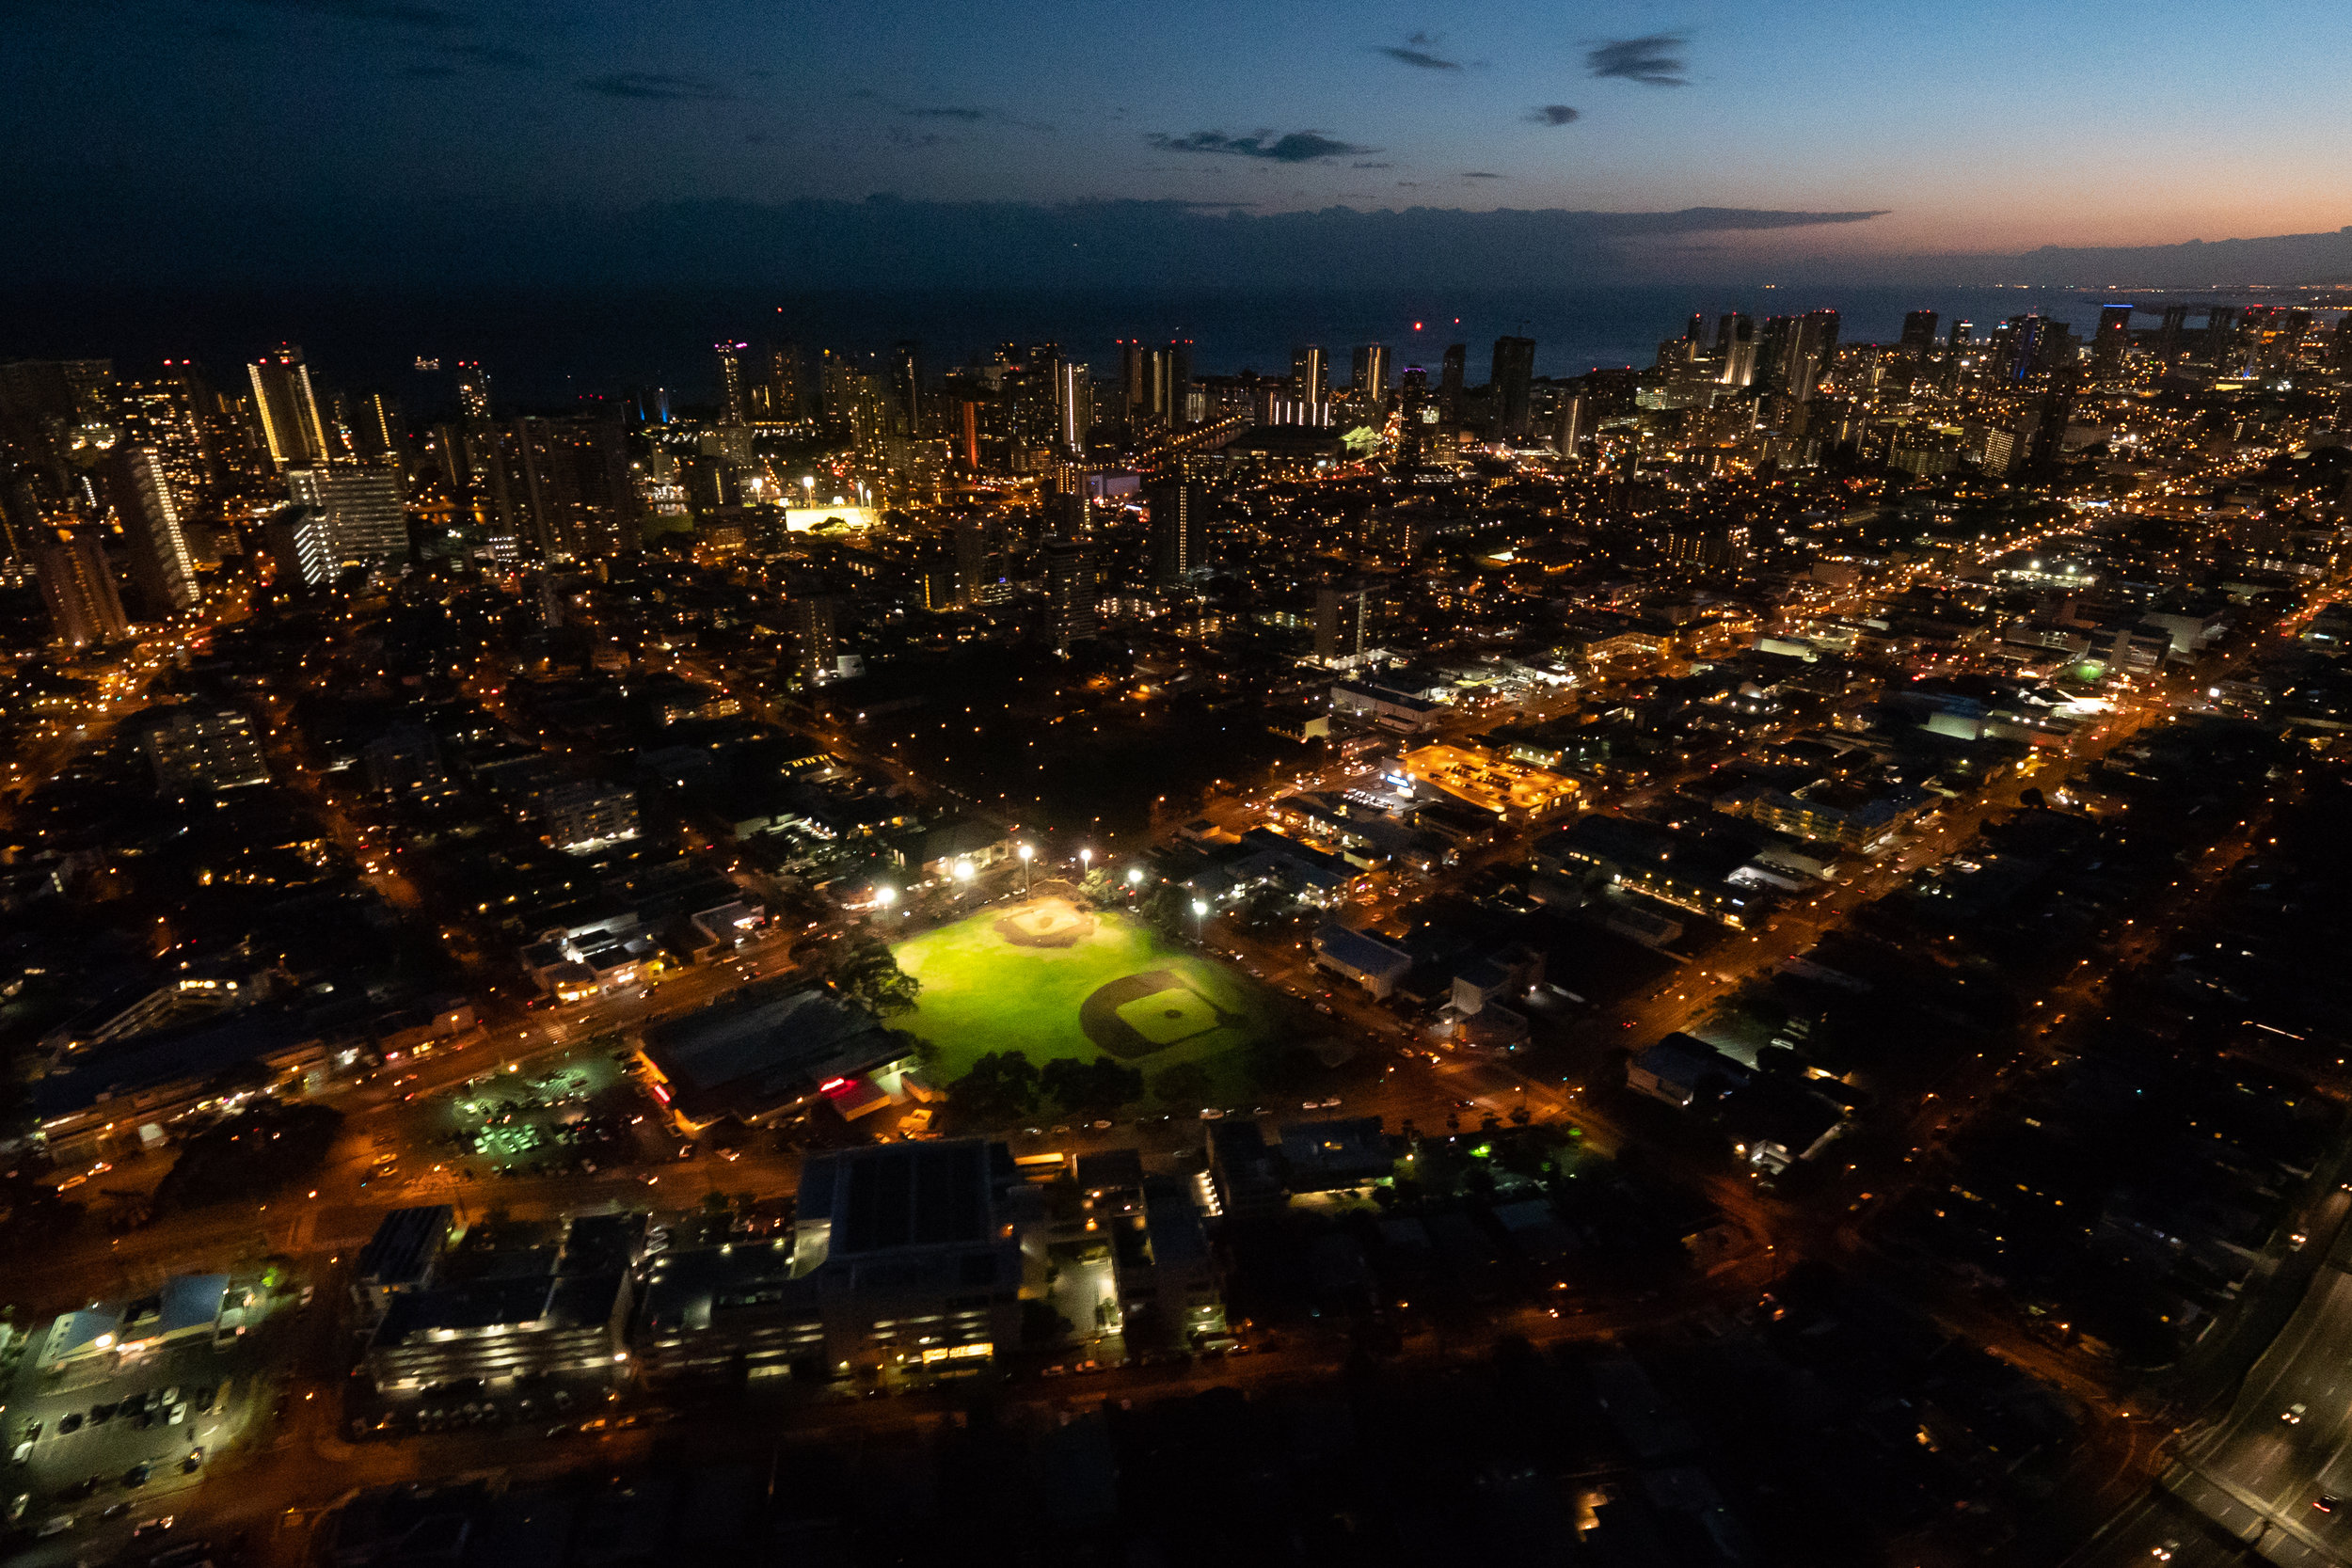 20180601_JohnsonControls_Aerial_Honolulu-5987.jpg